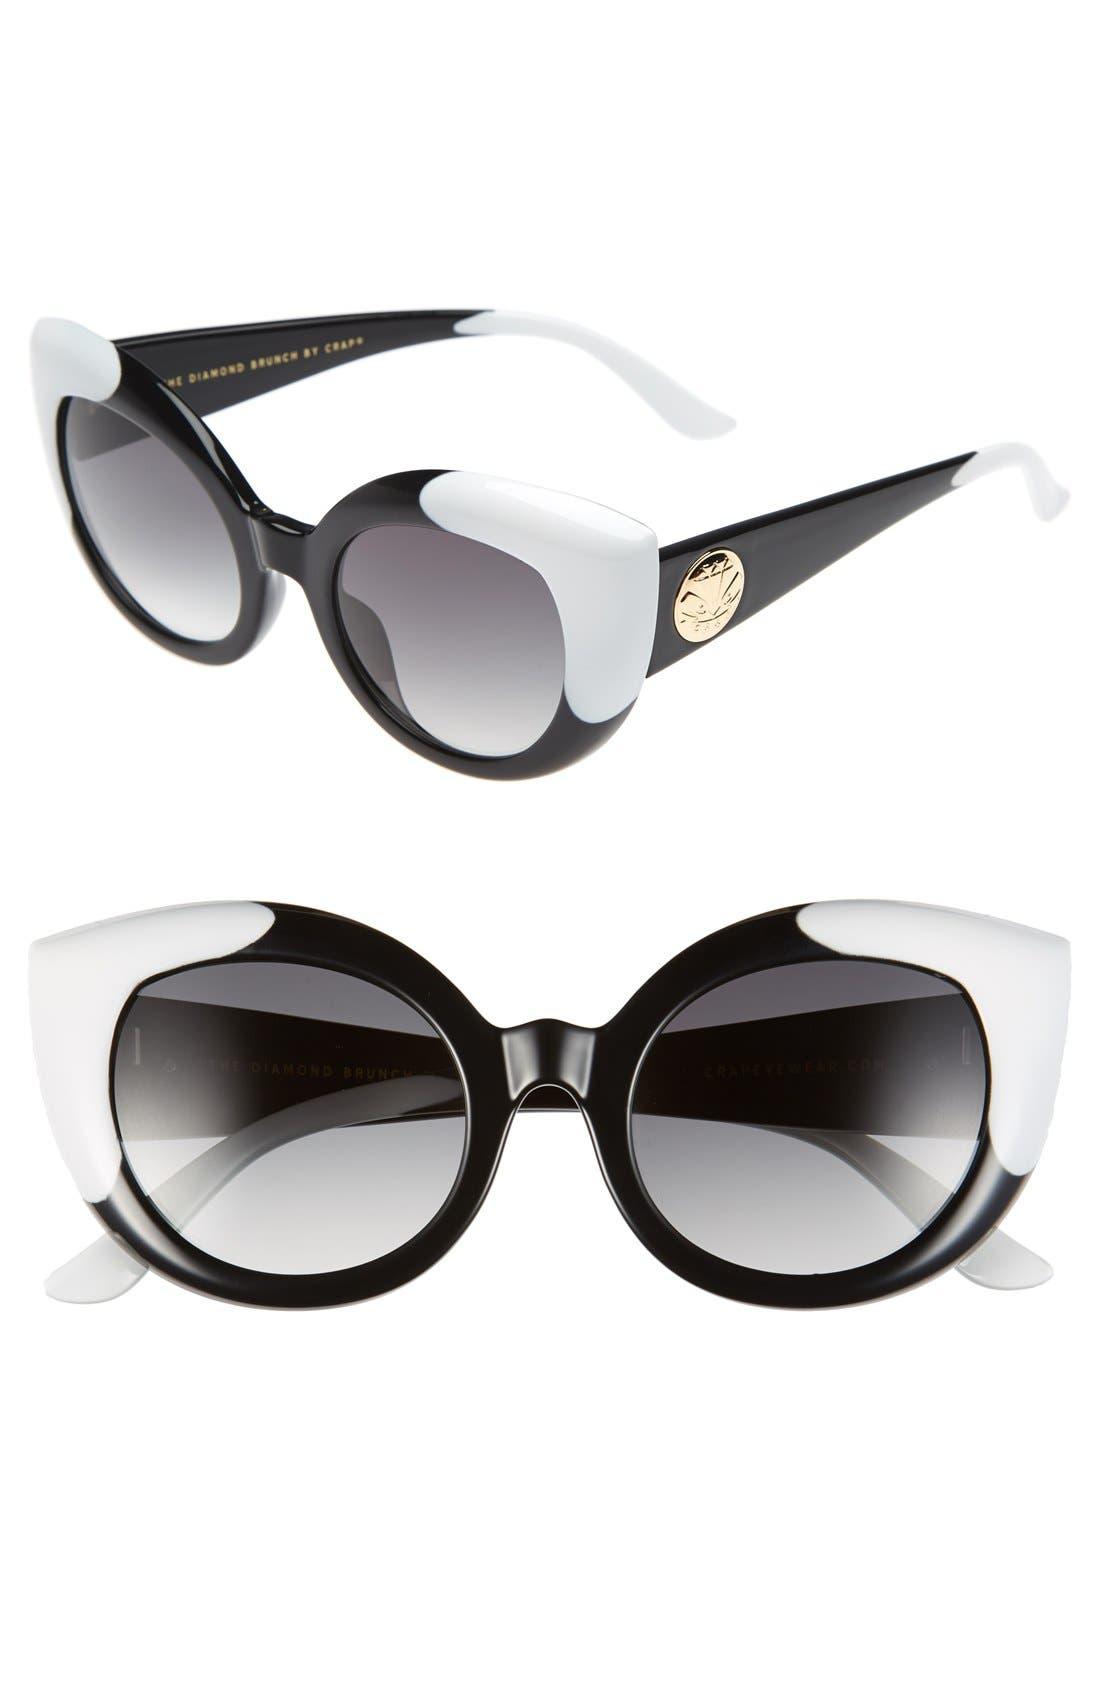 CRAP EYEWEAR 'The Diamond Brunch' 55mm Sunglasses, Main, color, 001